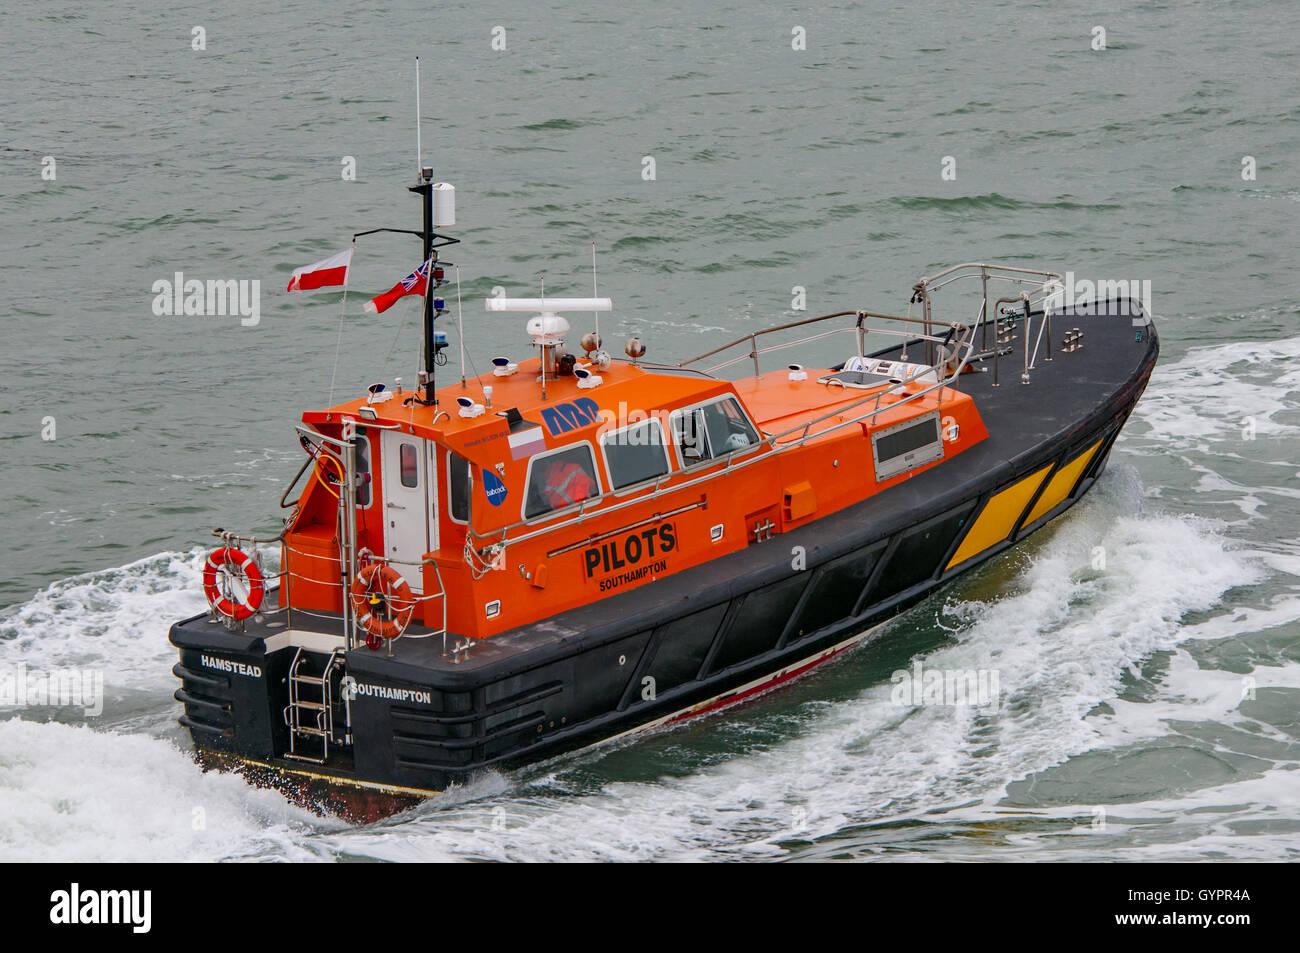 Pilot vessel returning to Portsmouth. - Stock Image